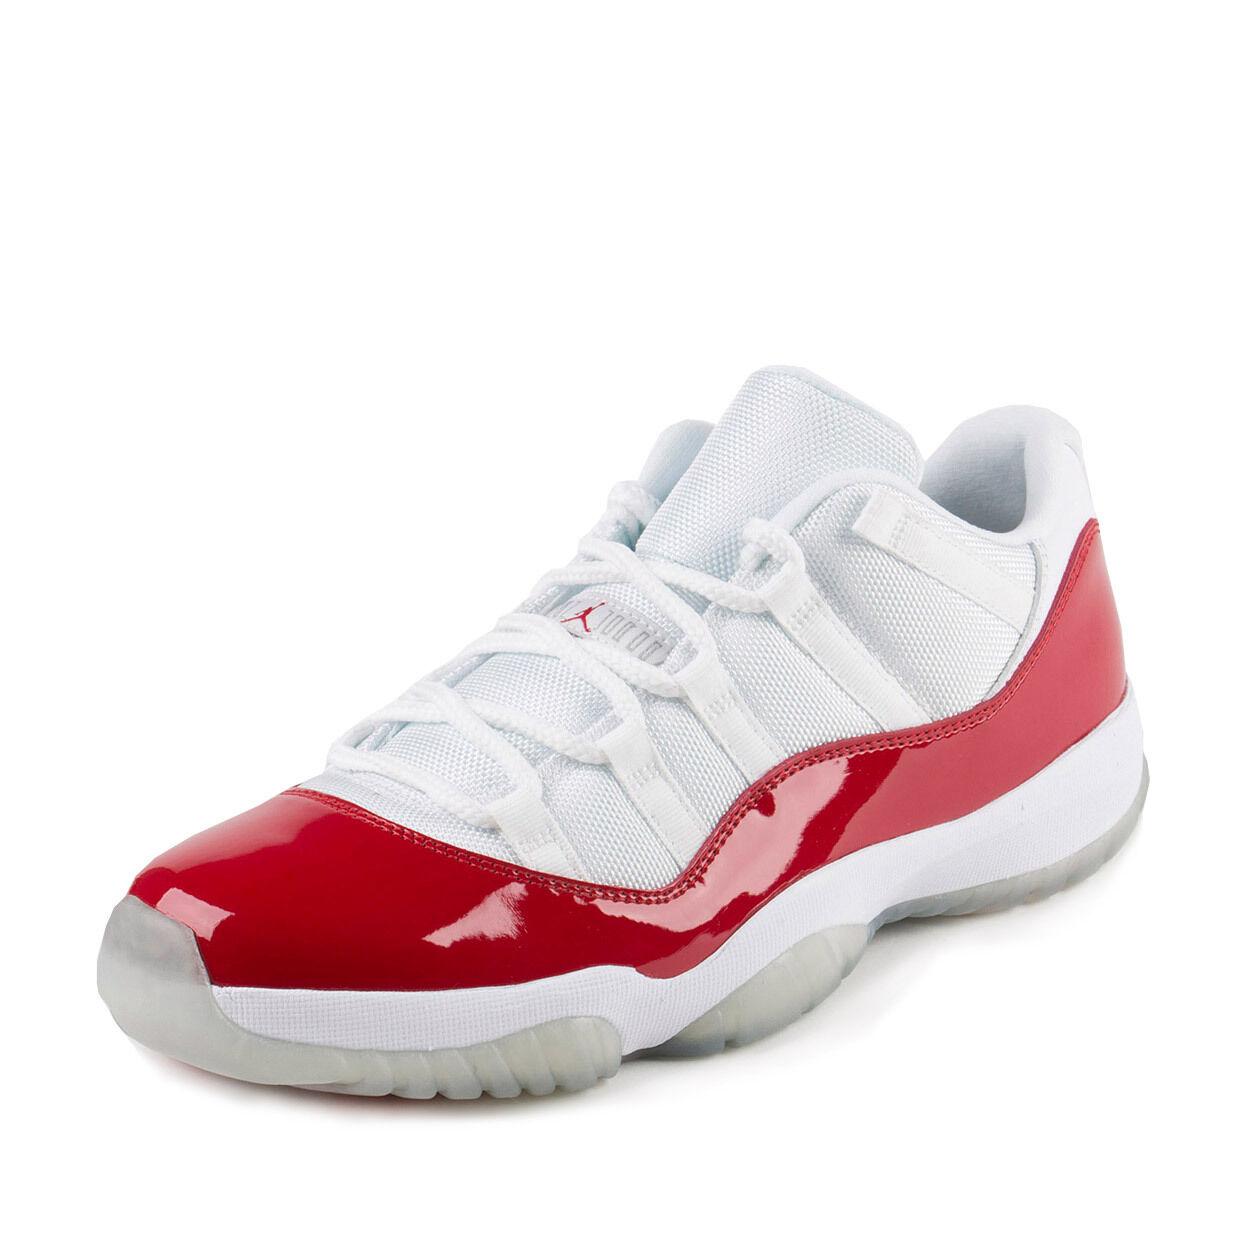 NEW AIR JORDAN XI LOW WHITE VARSITY RED 528895 102 SIZE 14 US